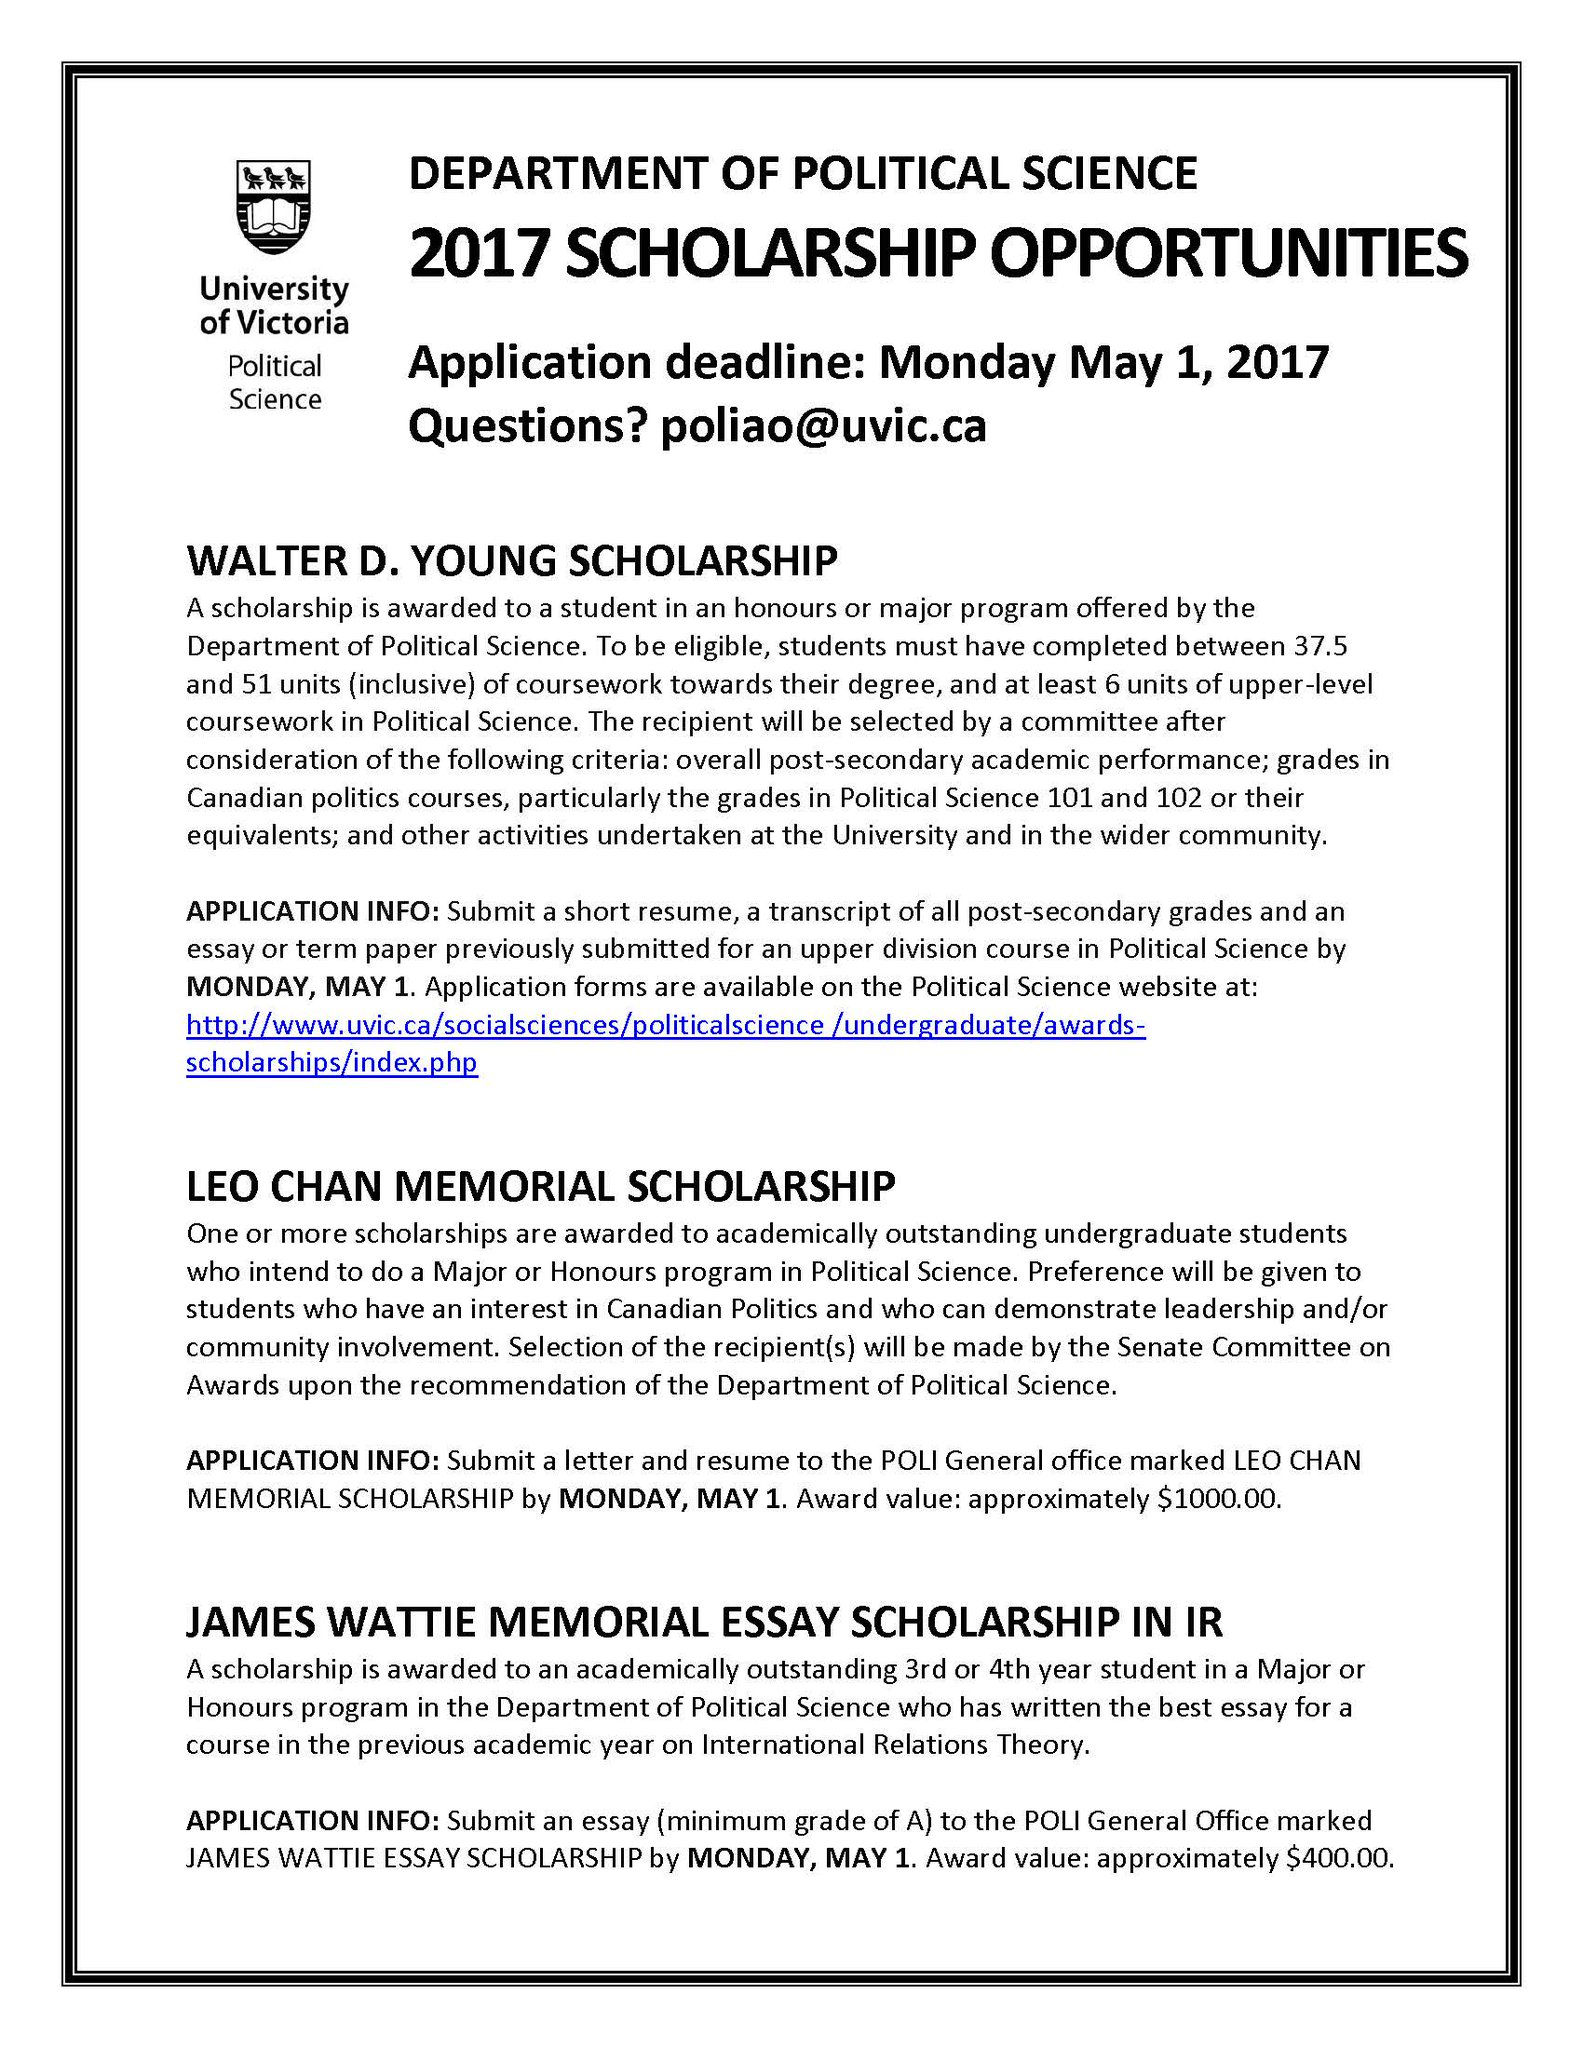 Political scholarship essay best analysis essay editing services gb